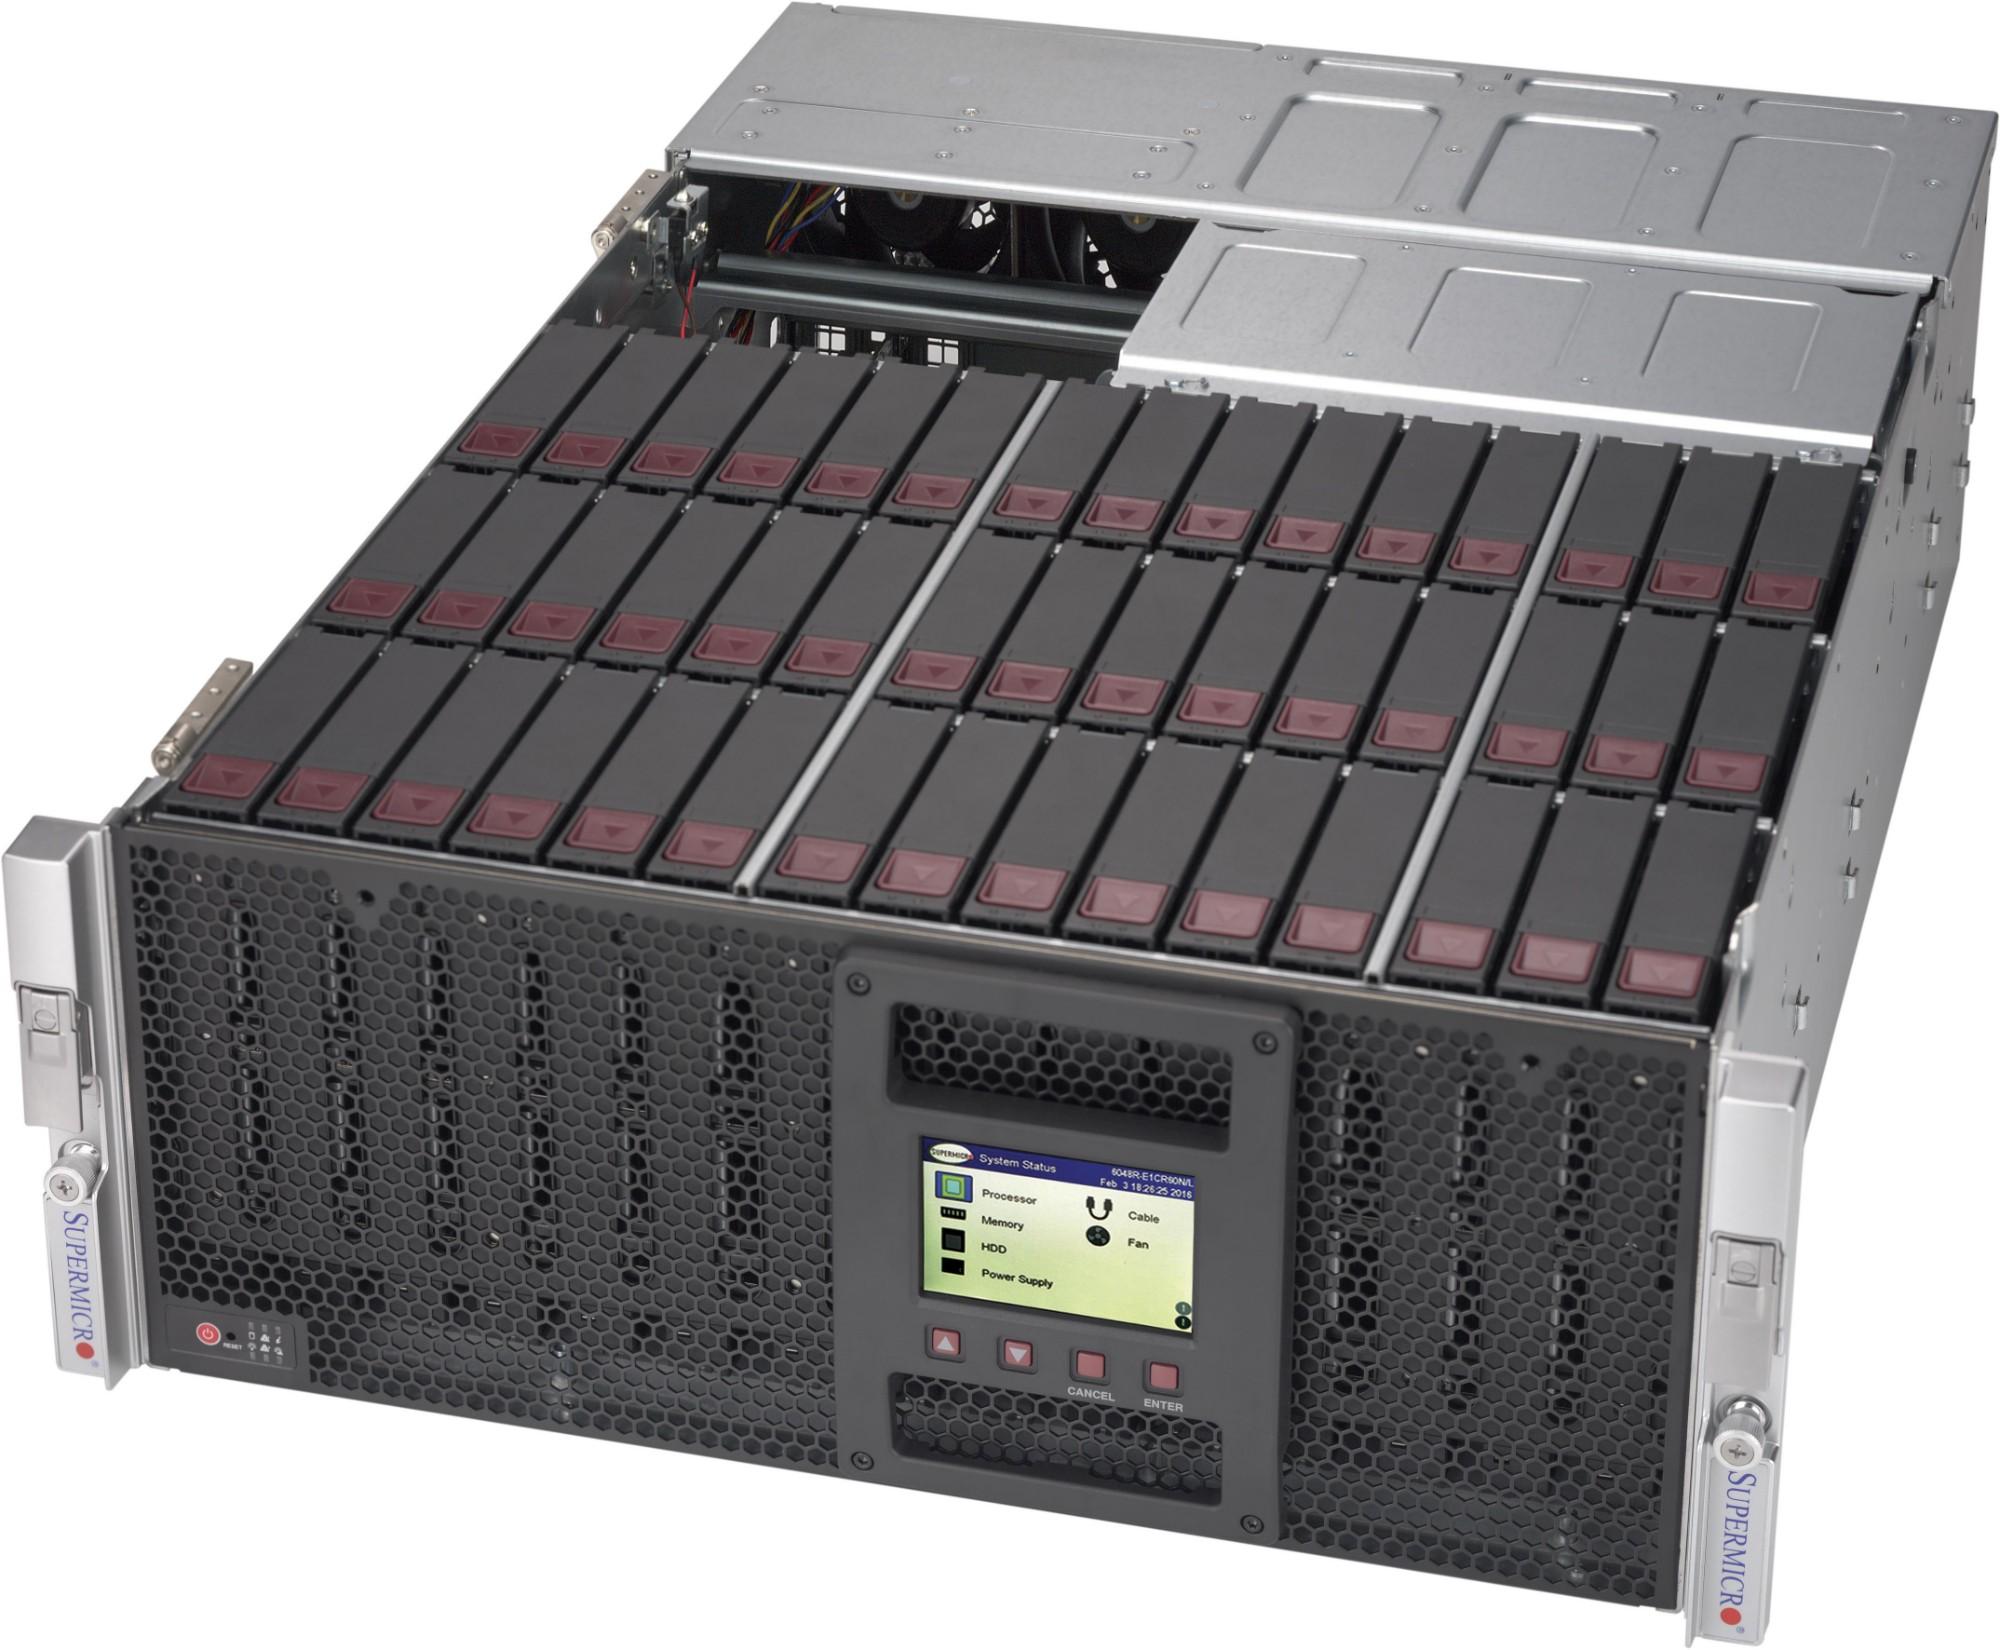 Supermicro SuperChassis 946LE1C-R1K66JBOD network equipment chassis 4U Black